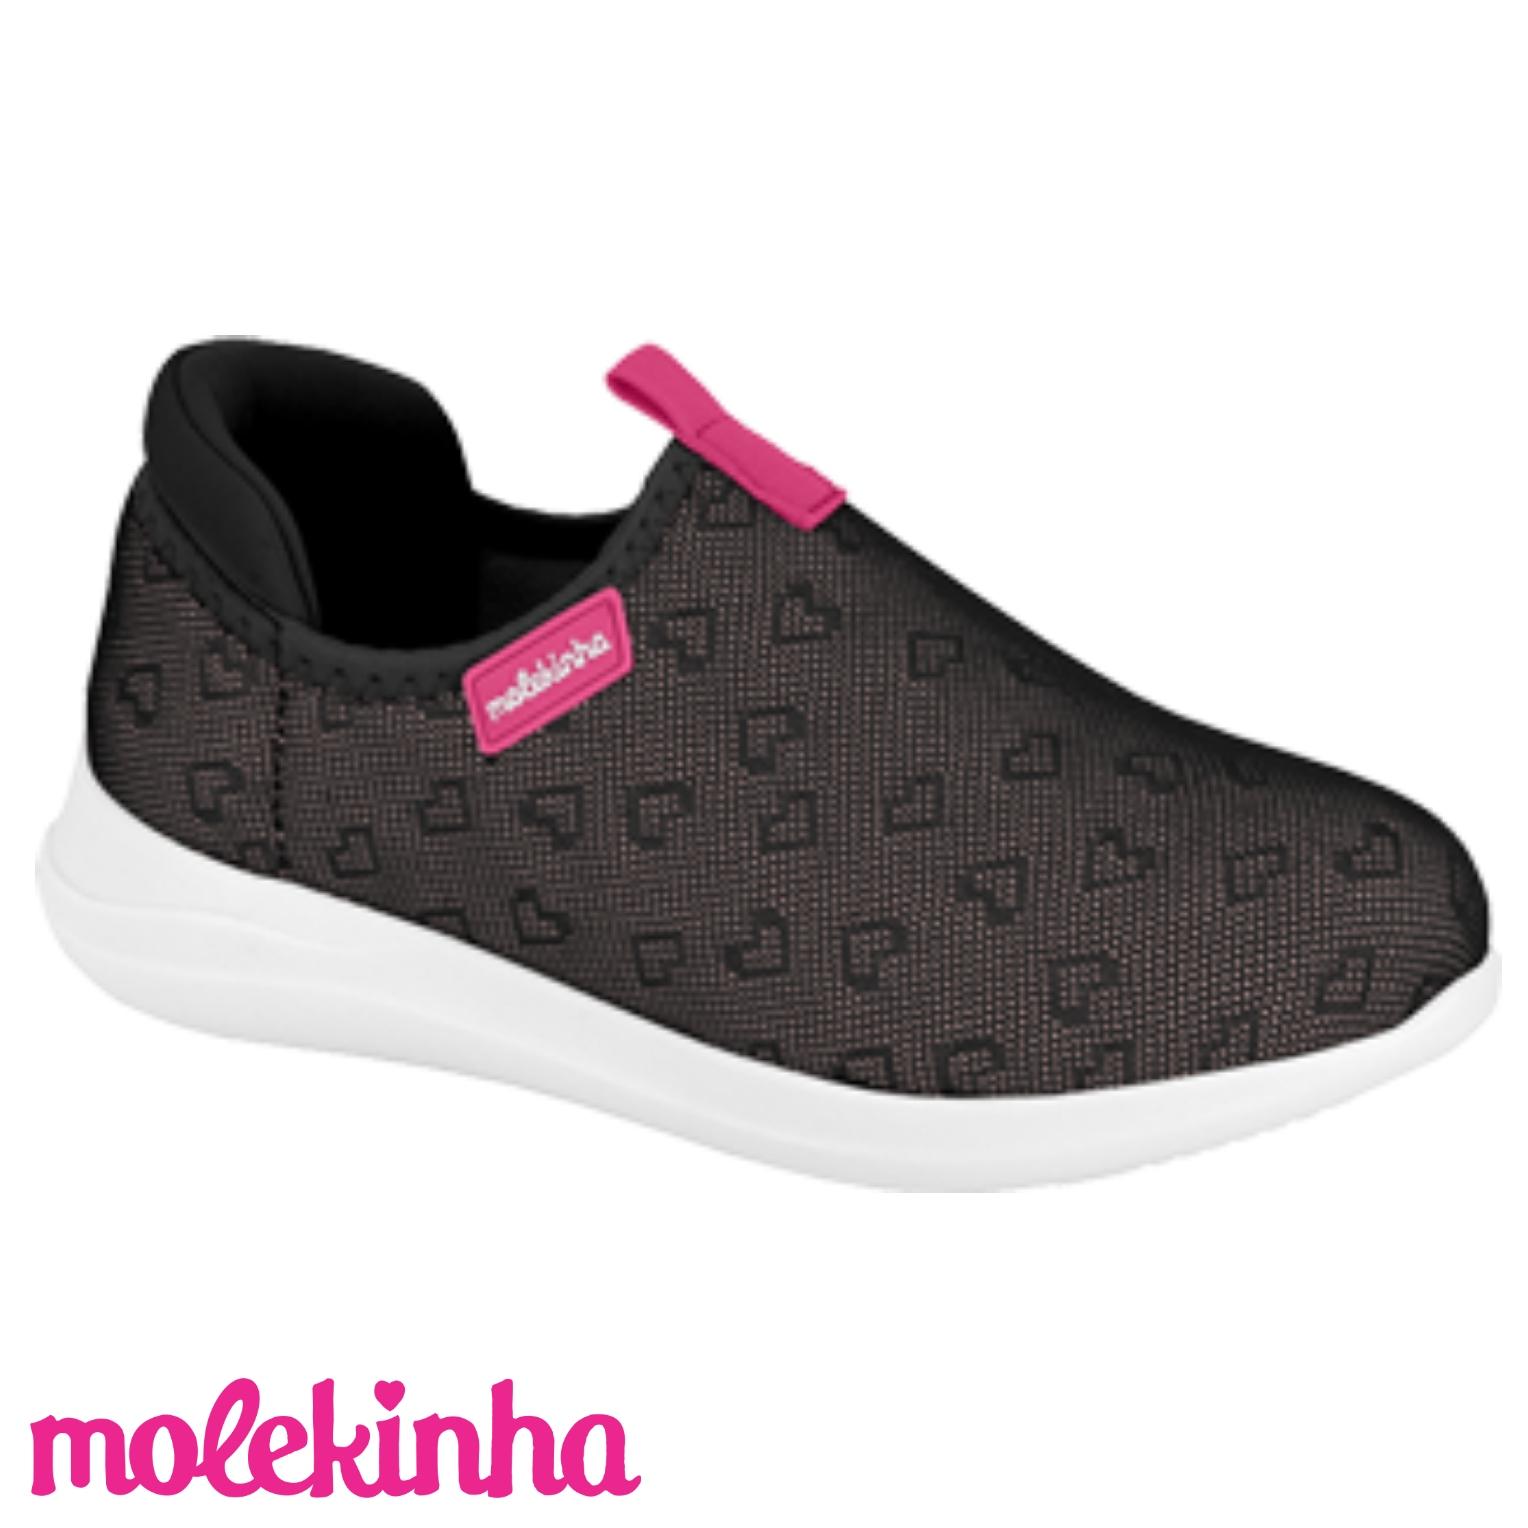 Tenis Casual Molekinha 2503321